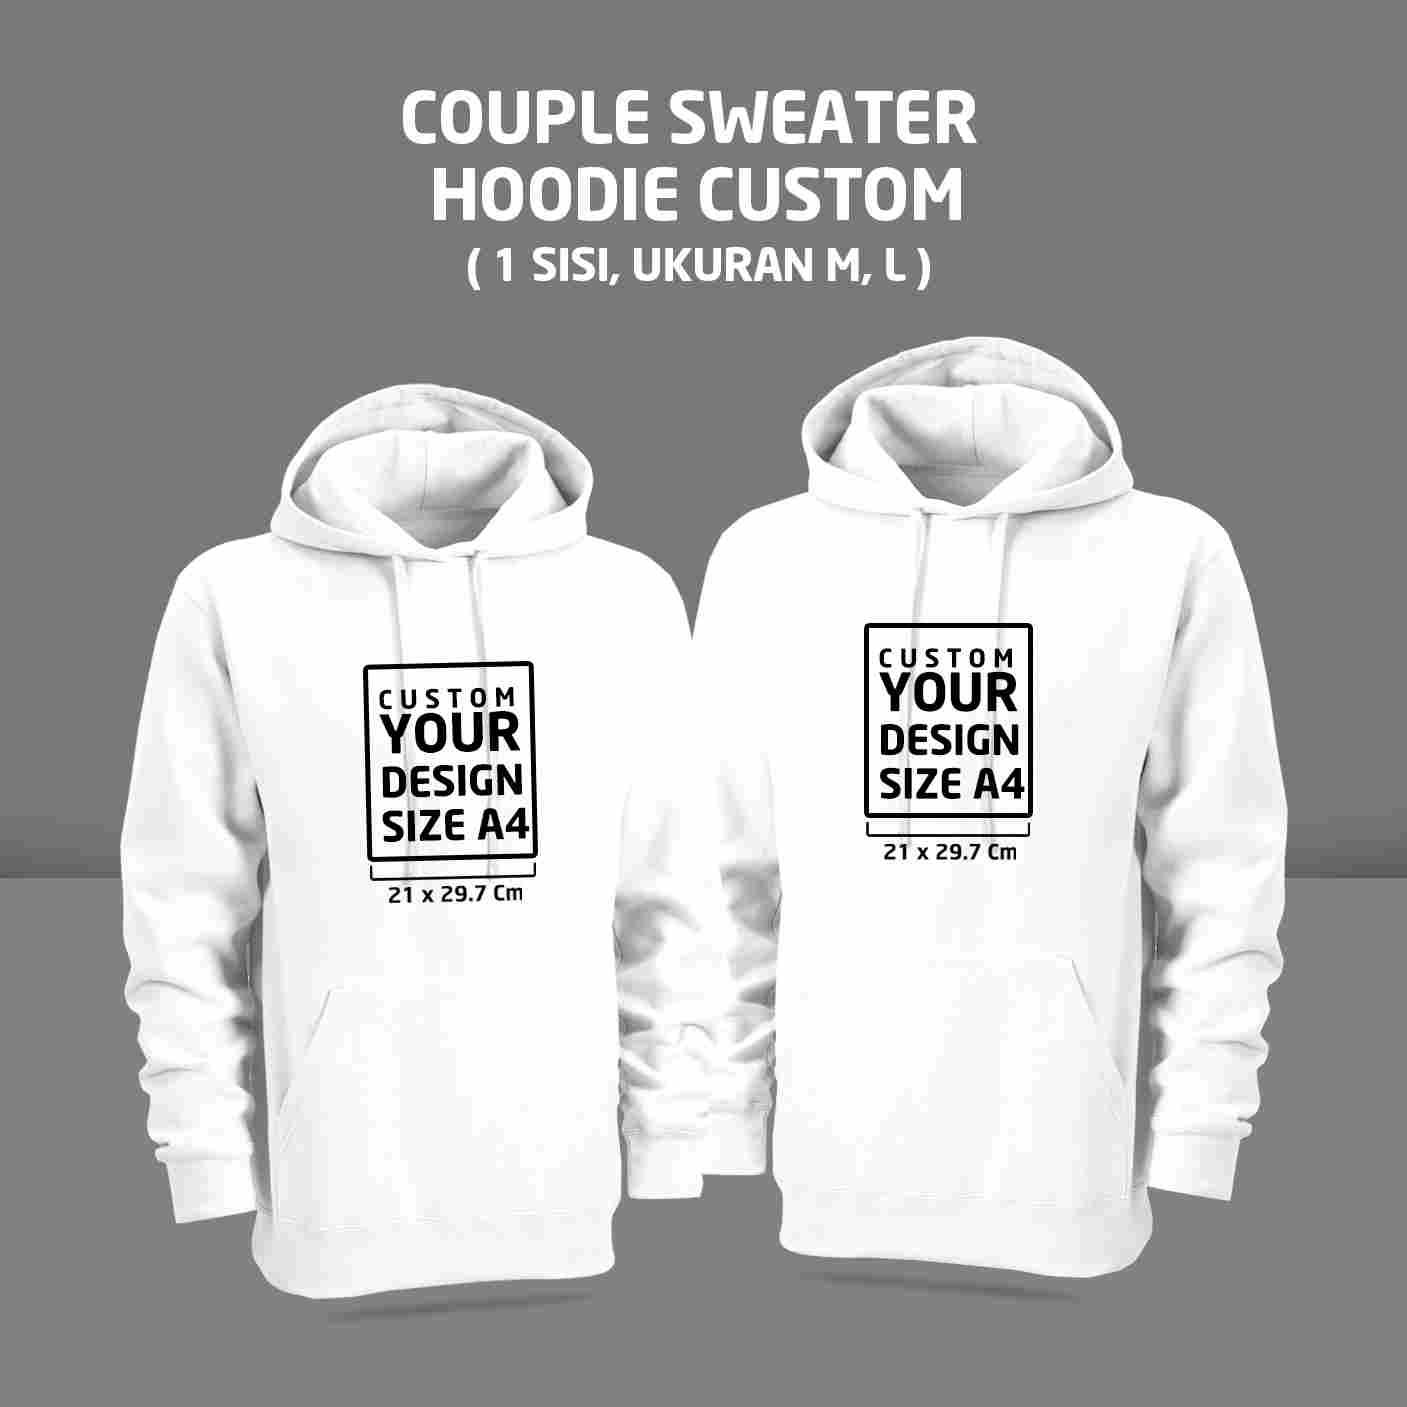 Couple Sweater Hoodie Custom 1 Sisi ( M,L)